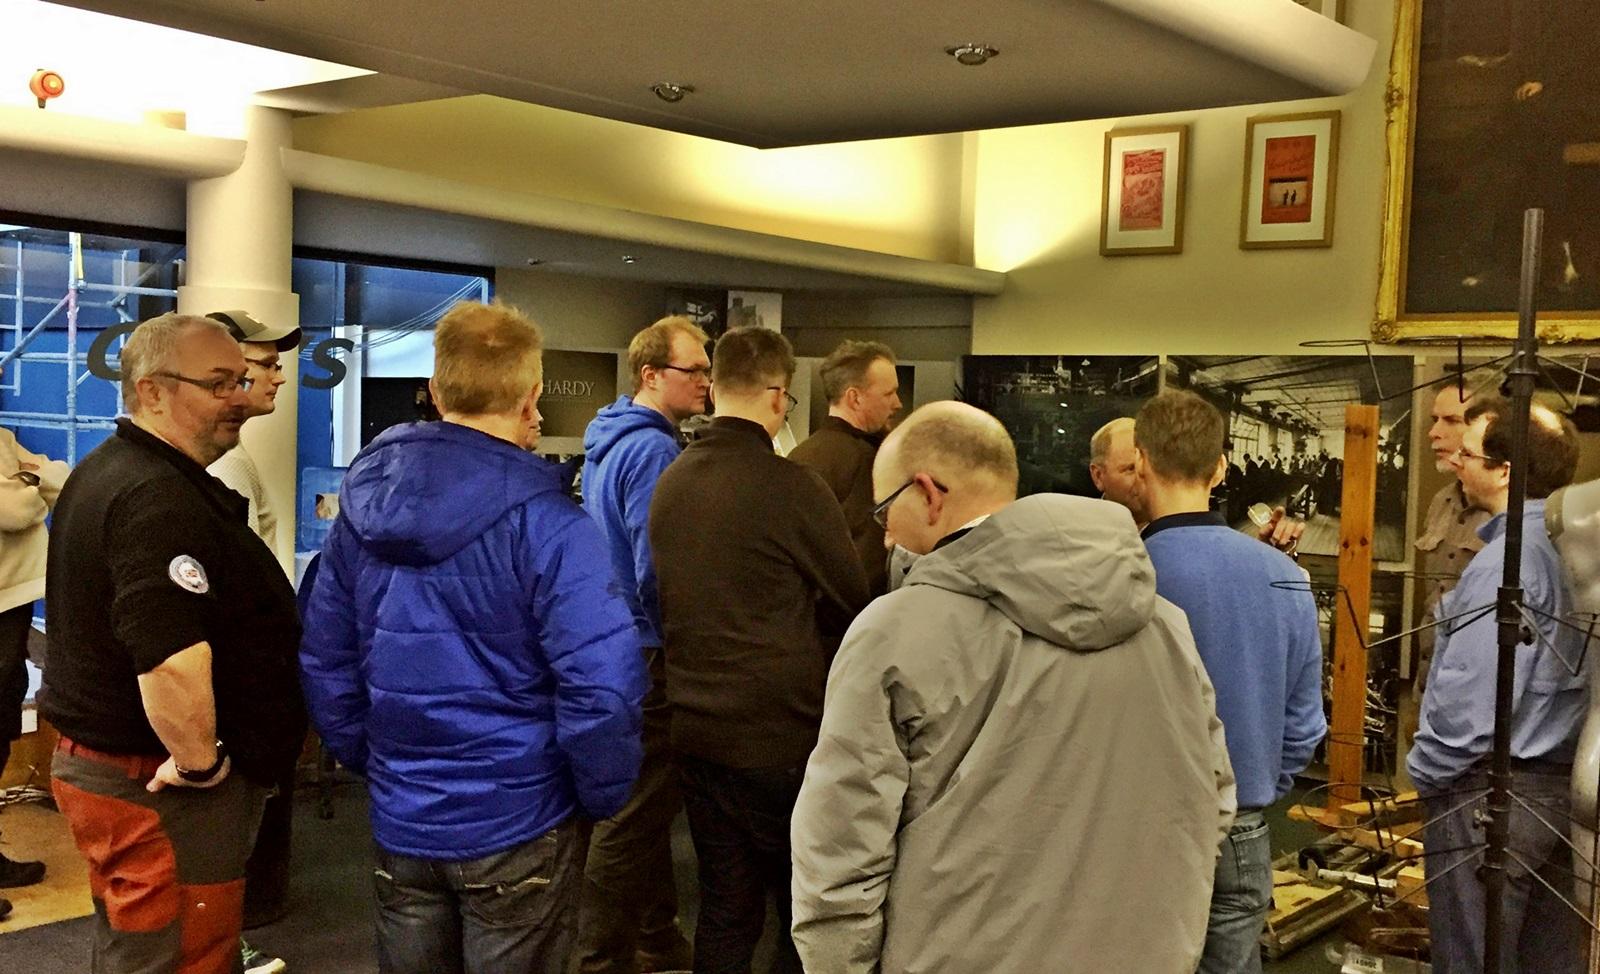 Forhandlere fra hele Norge tok turen til Hardy fabrikken, her en omvisning på museet som for tiden er under oppgradering